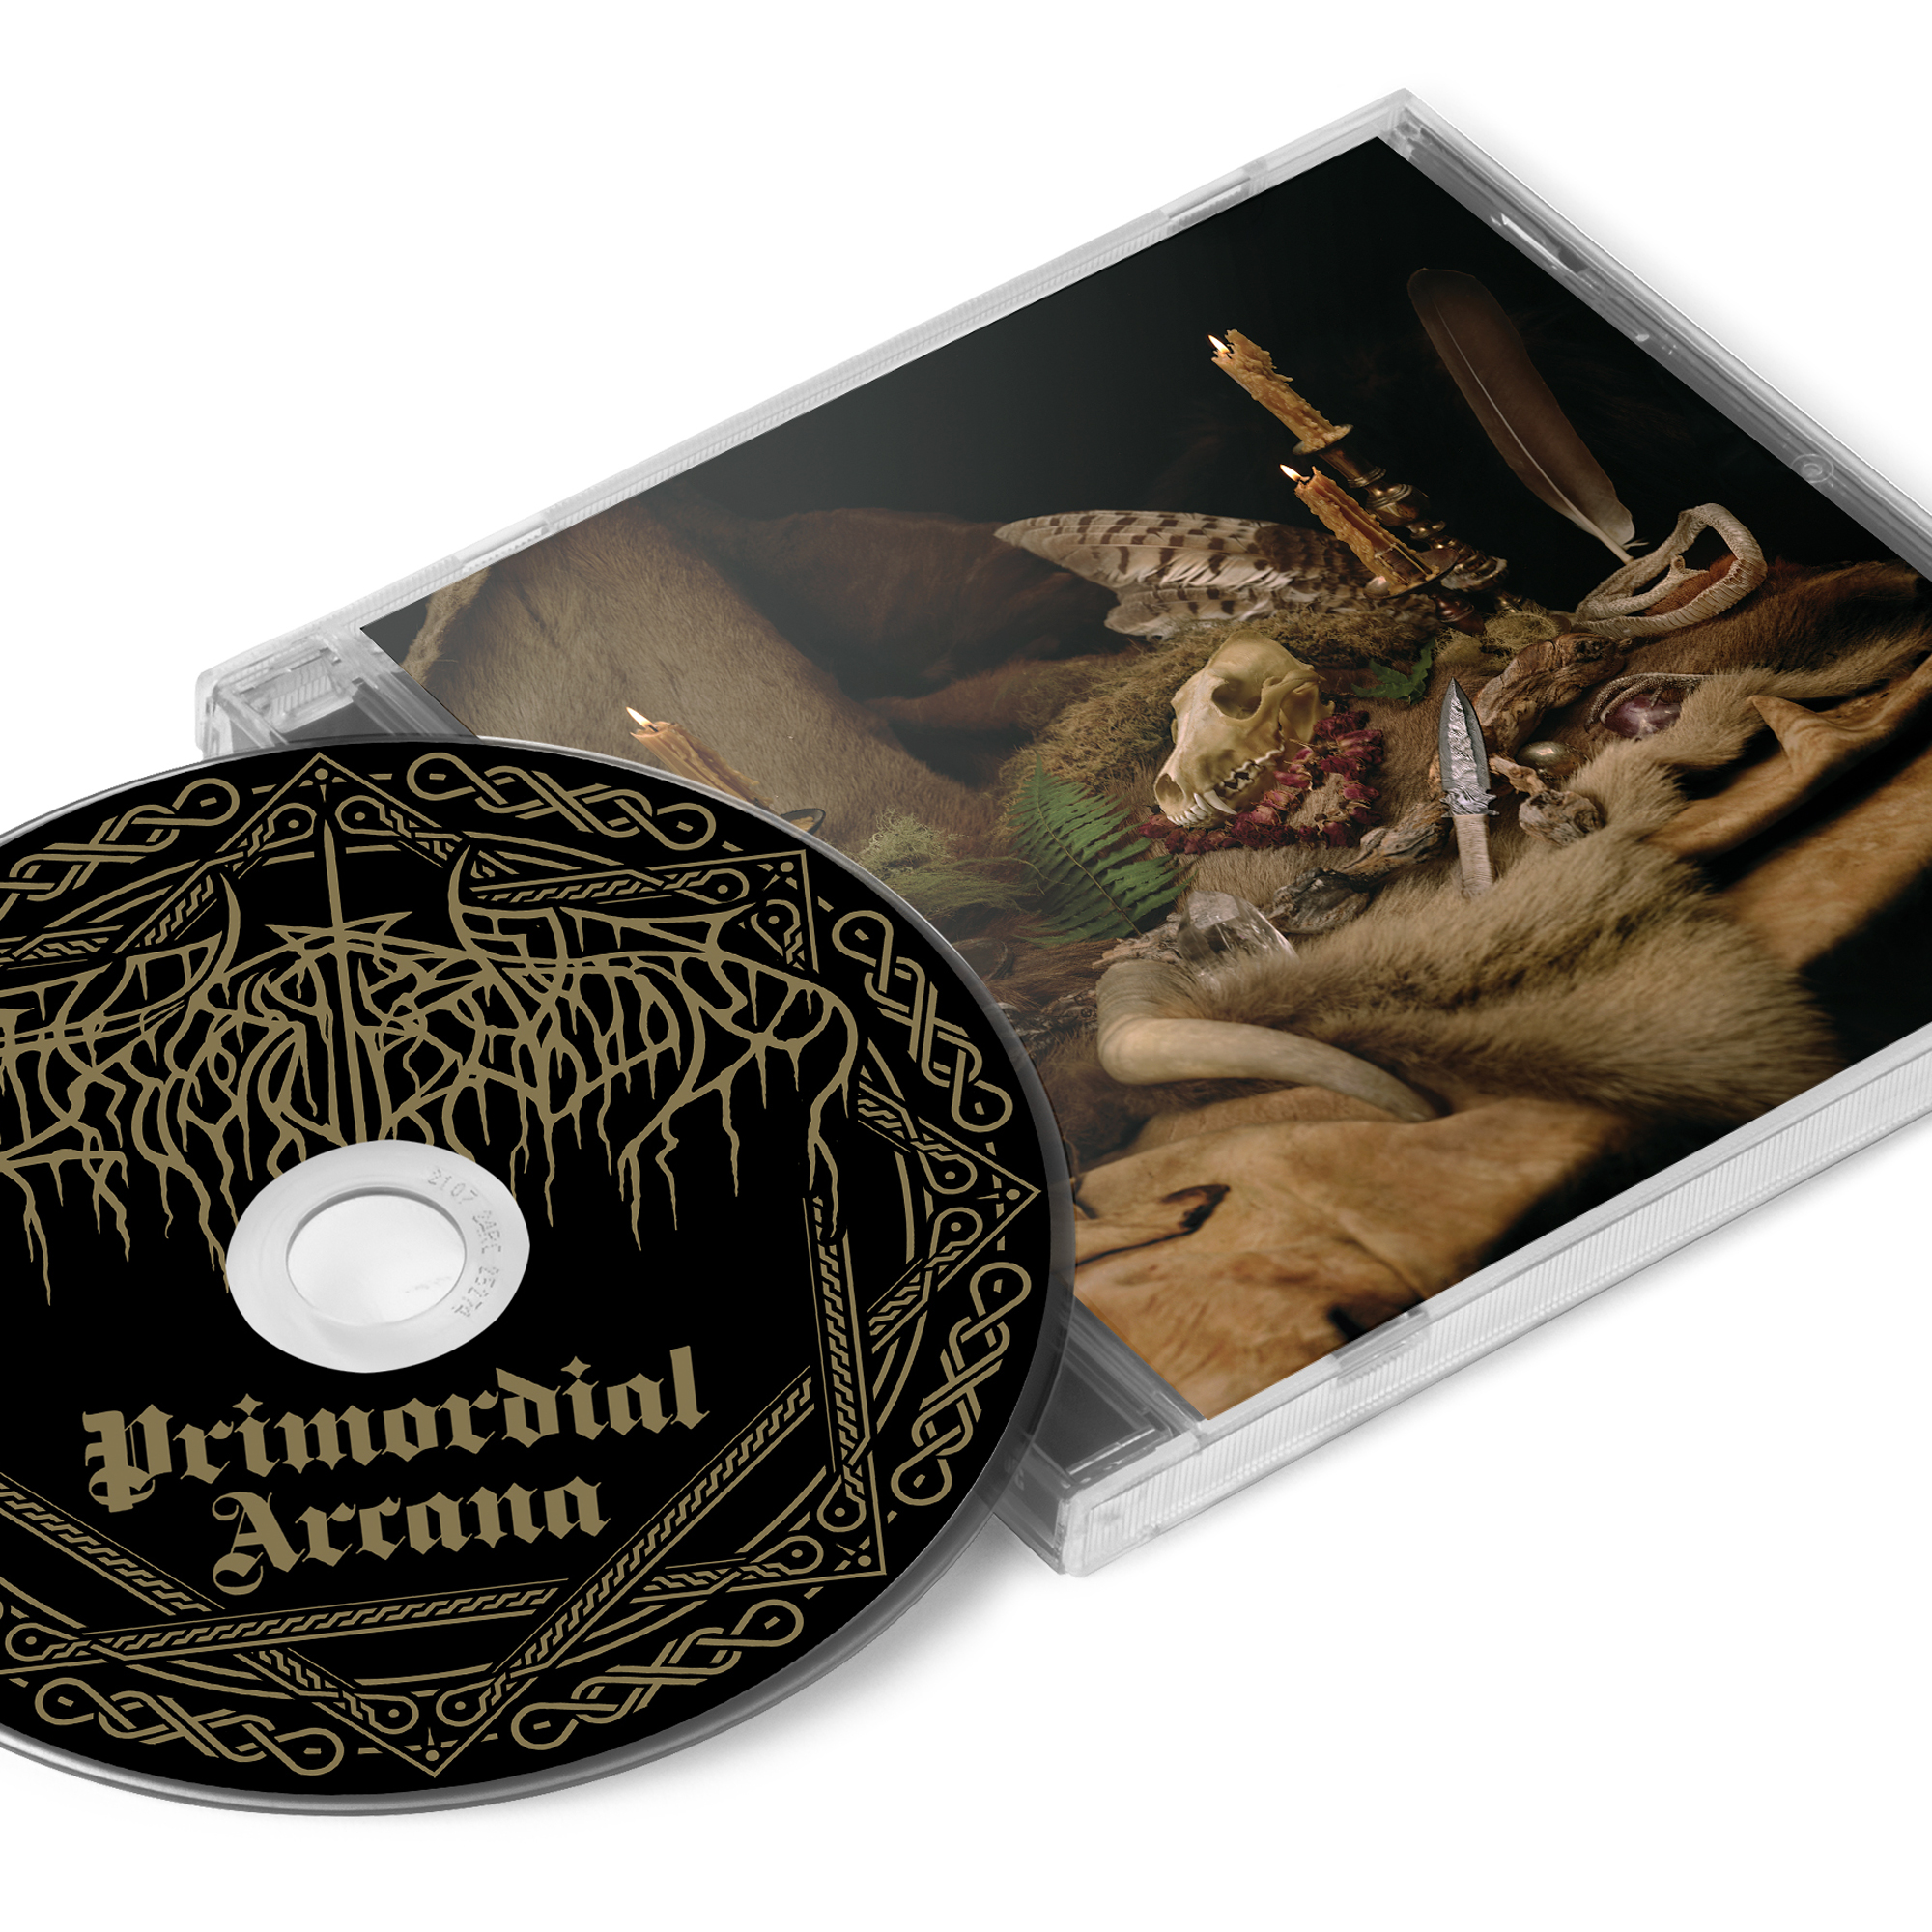 Primordial Arcana T Shirt + CD Bundle